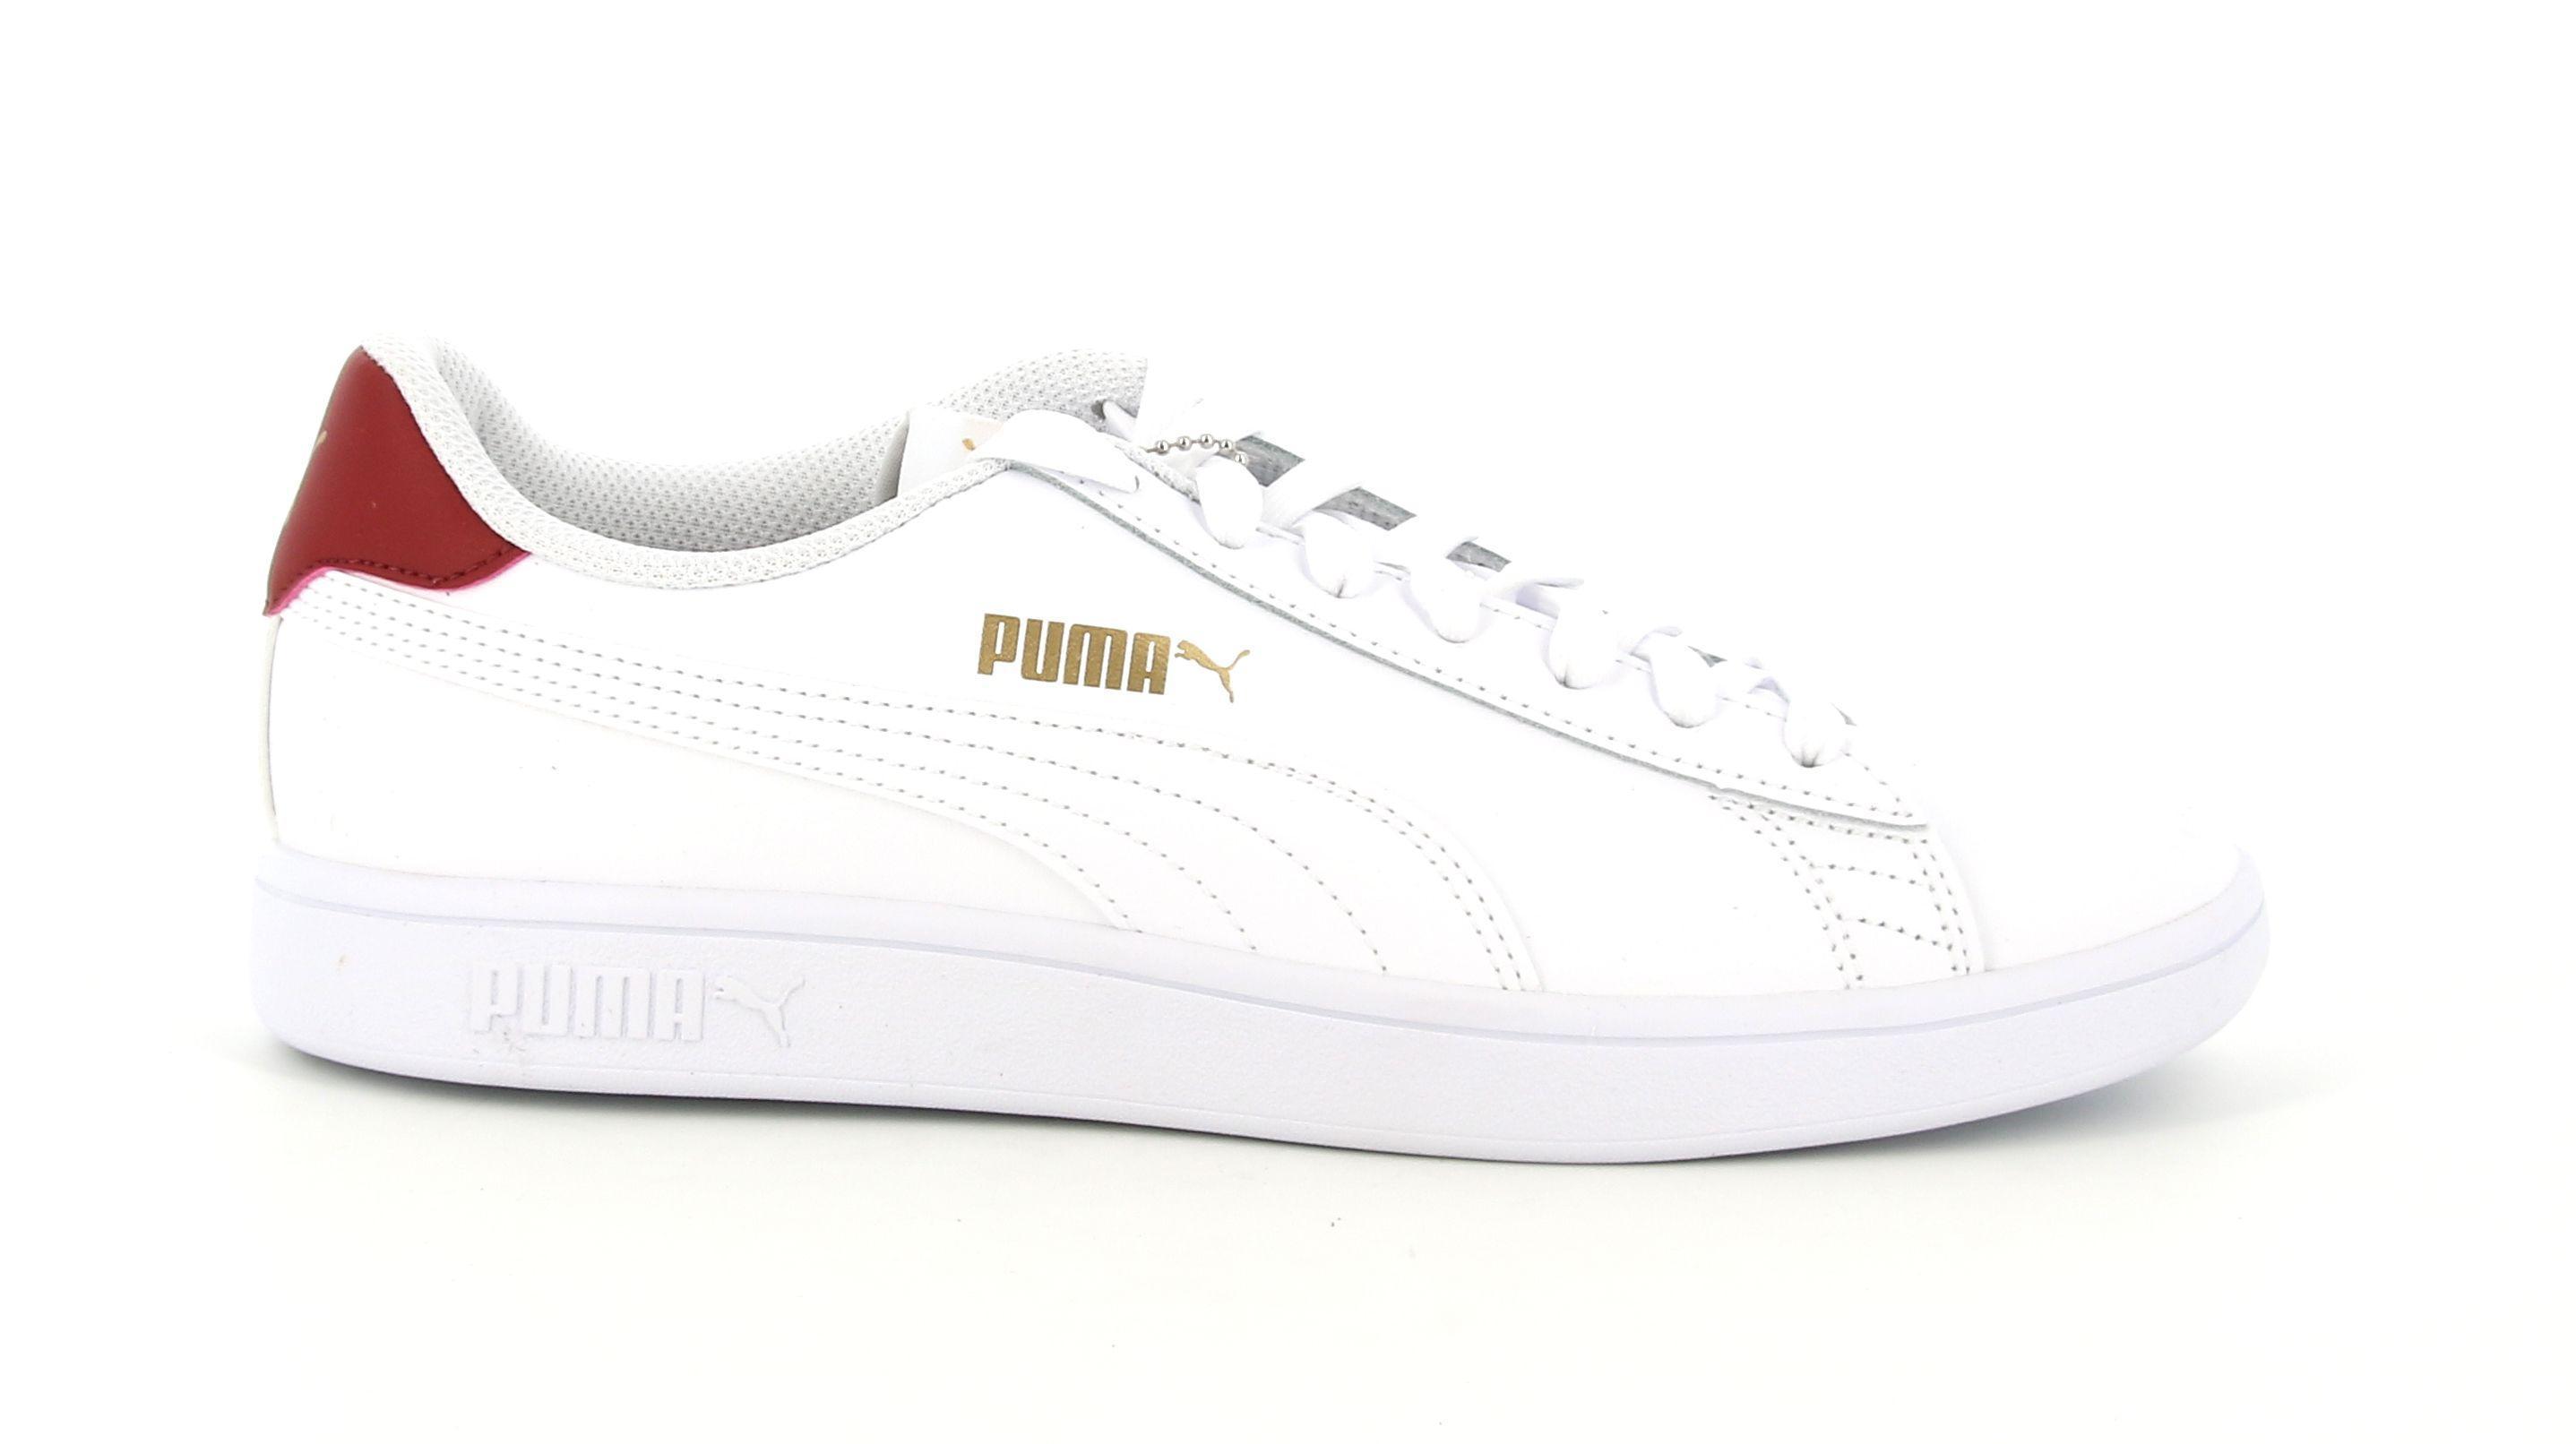 puma puma smash v2 l 365215 015 sneakers unisex uomo bianca